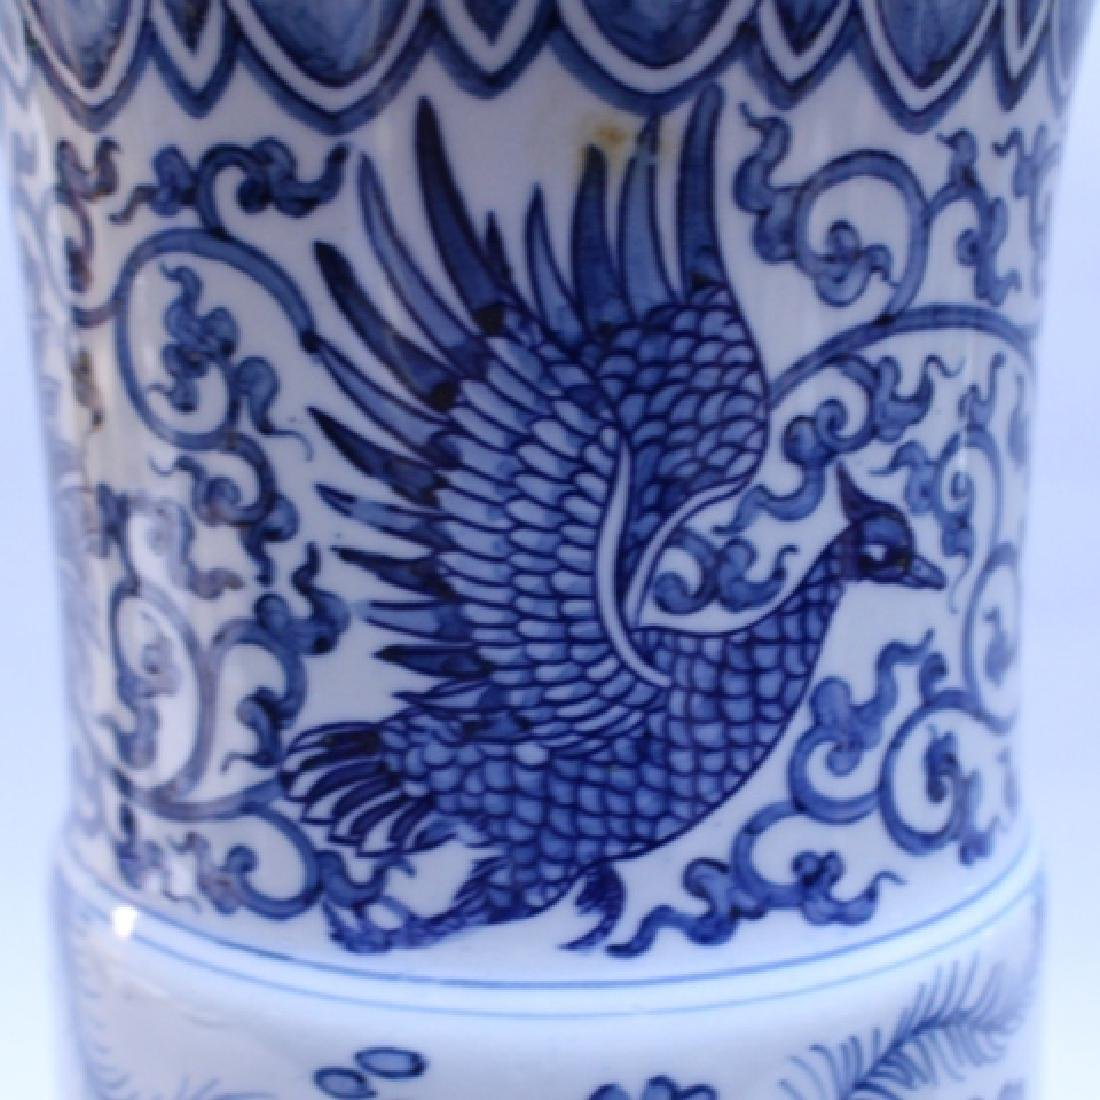 Decorative Blue and White Porcelain Gu Vase - 7